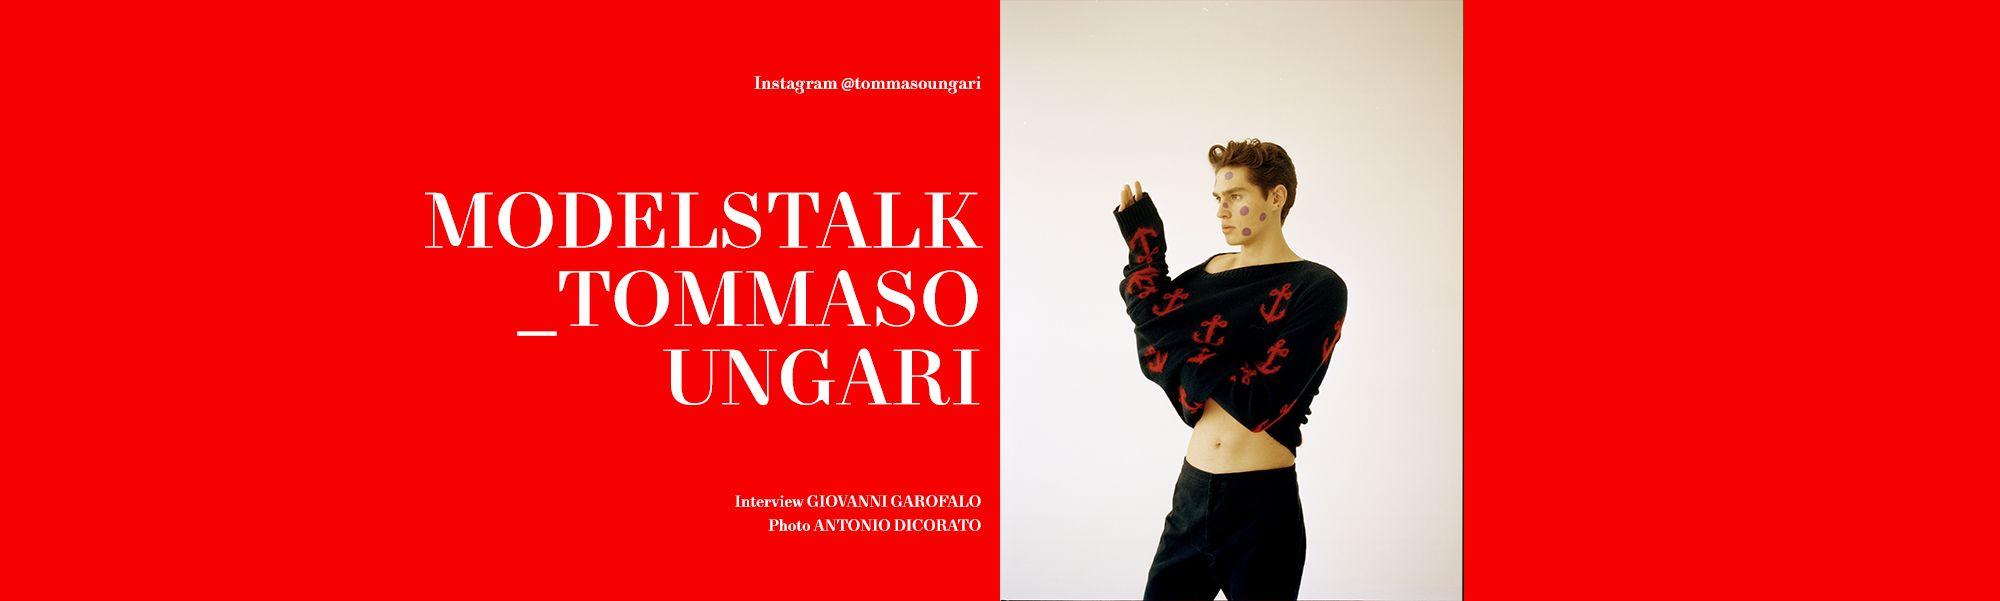 tommaso-ungari-talking-heads-thegreatestmagazine-banner